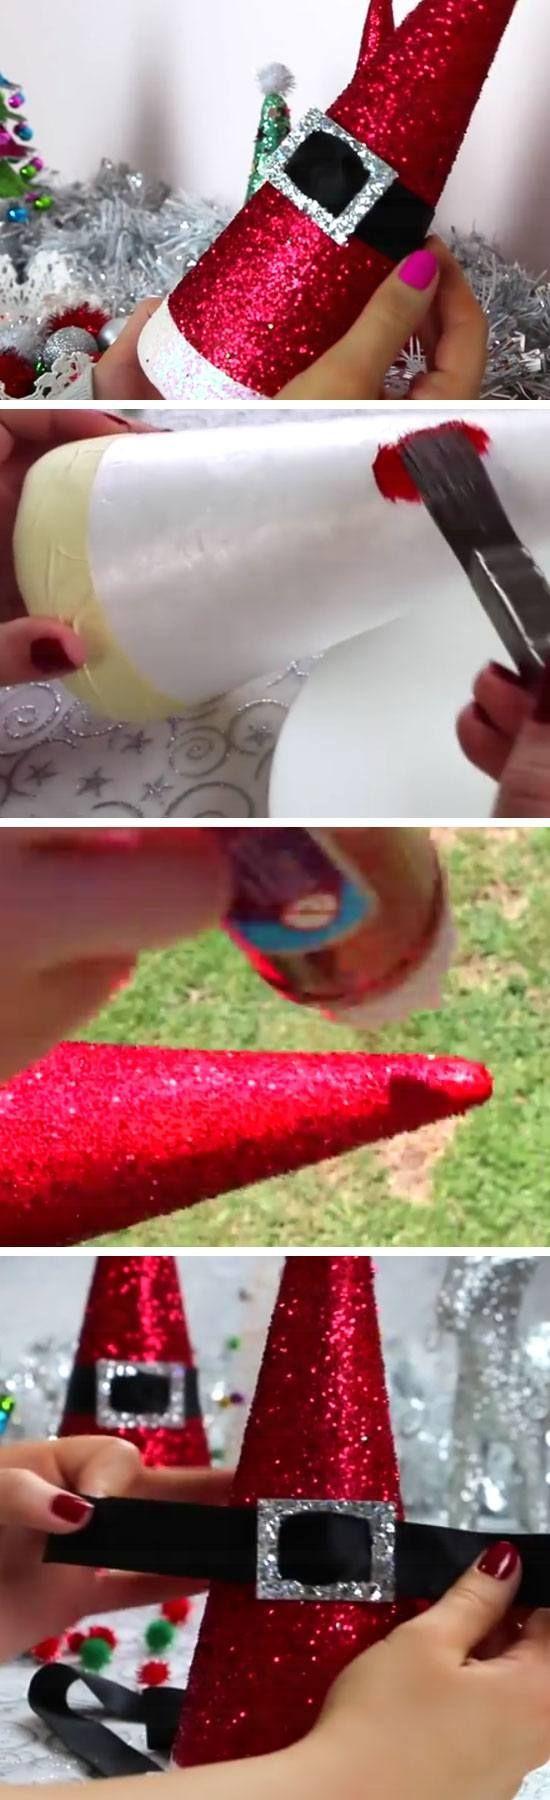 DIY Santa Hat Cones | Dollar Store DIY Christmas Decor Ideas on a Budget